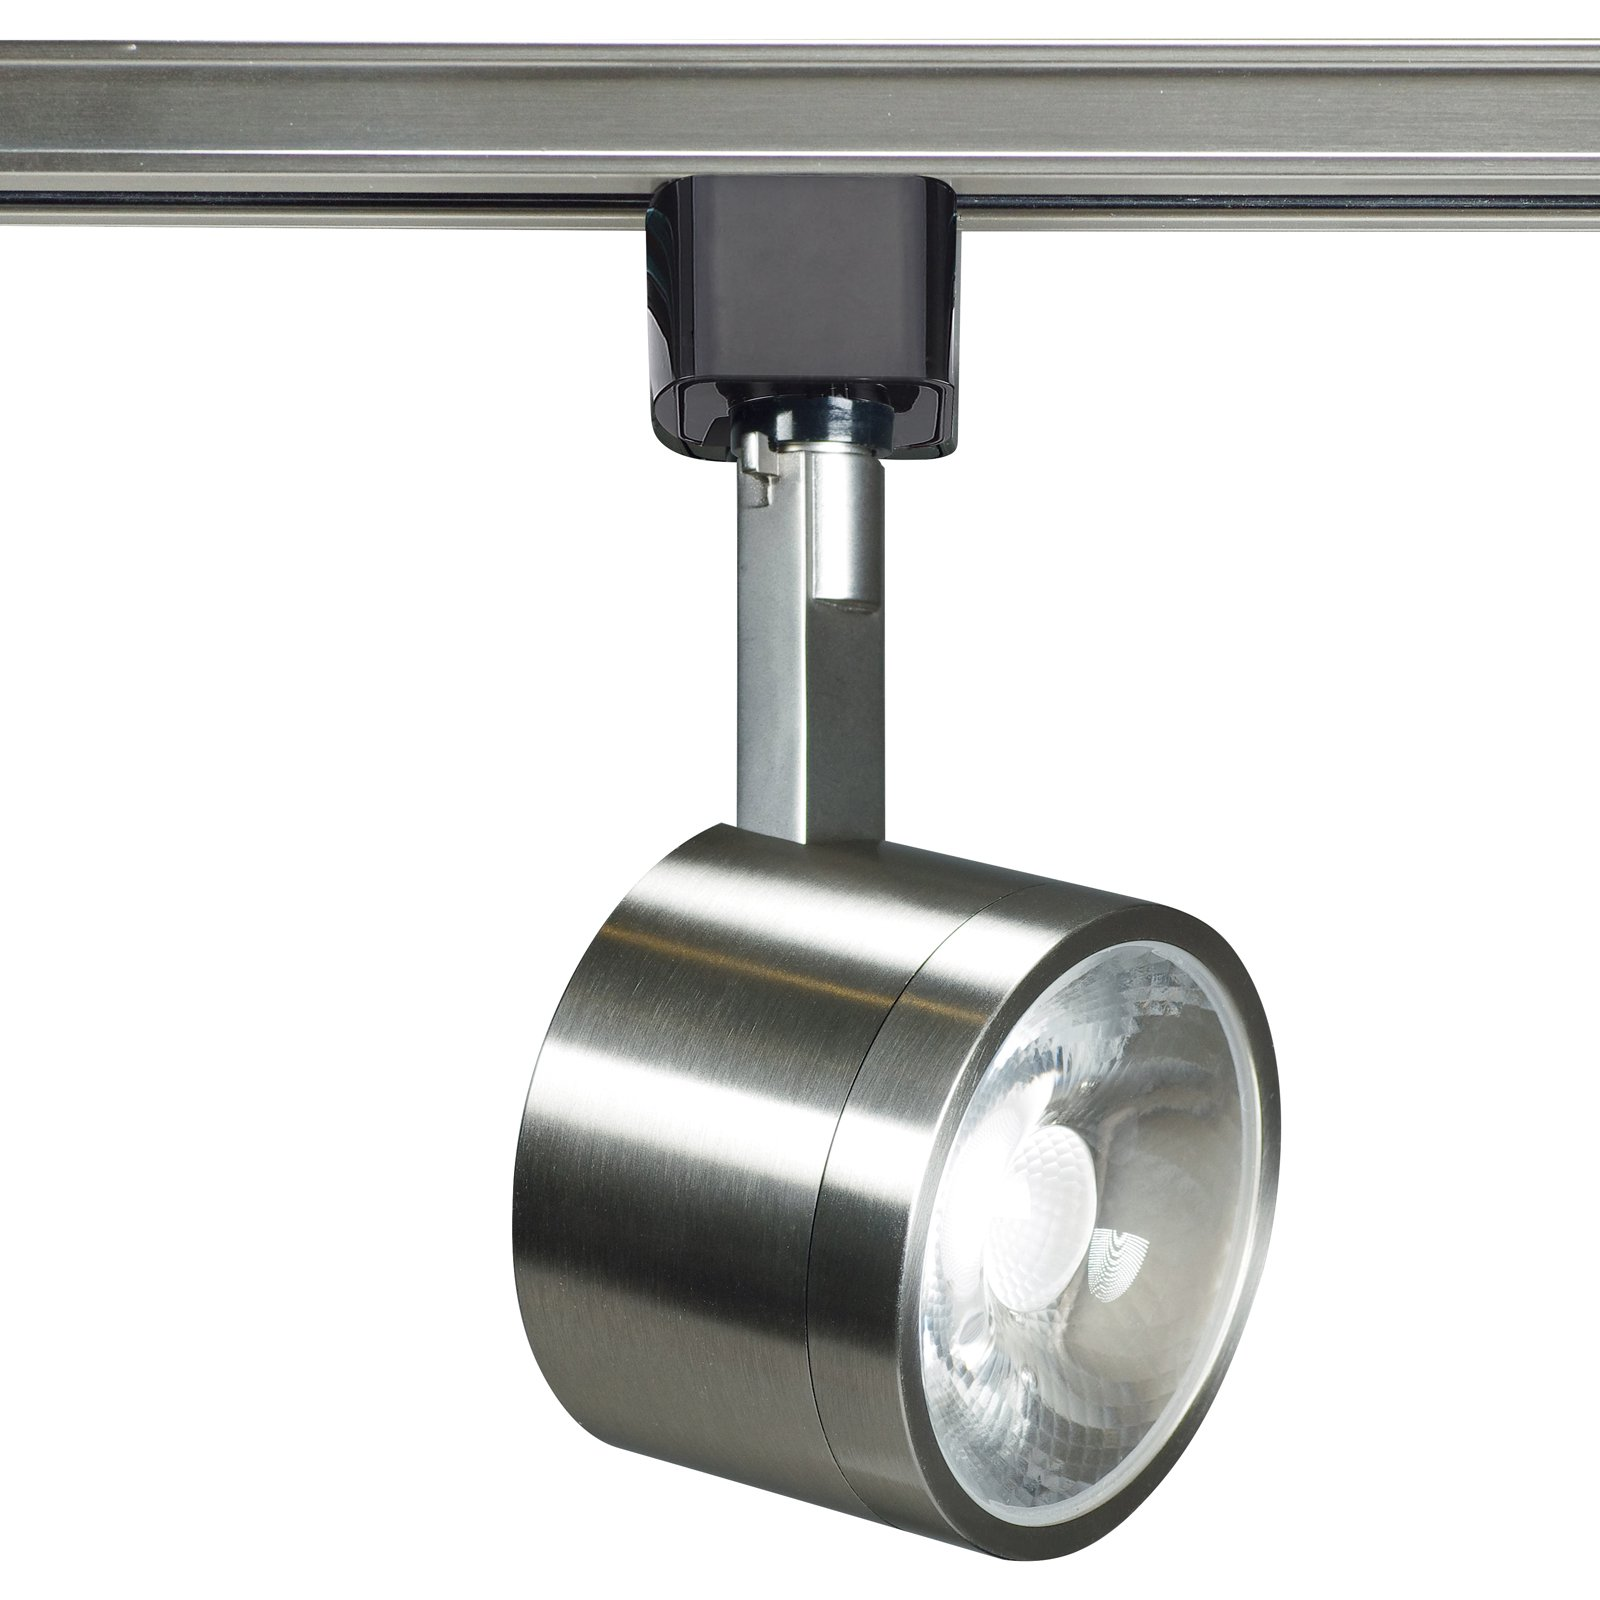 Nuvo TH40 Round Track Light by Nuvo Lighting